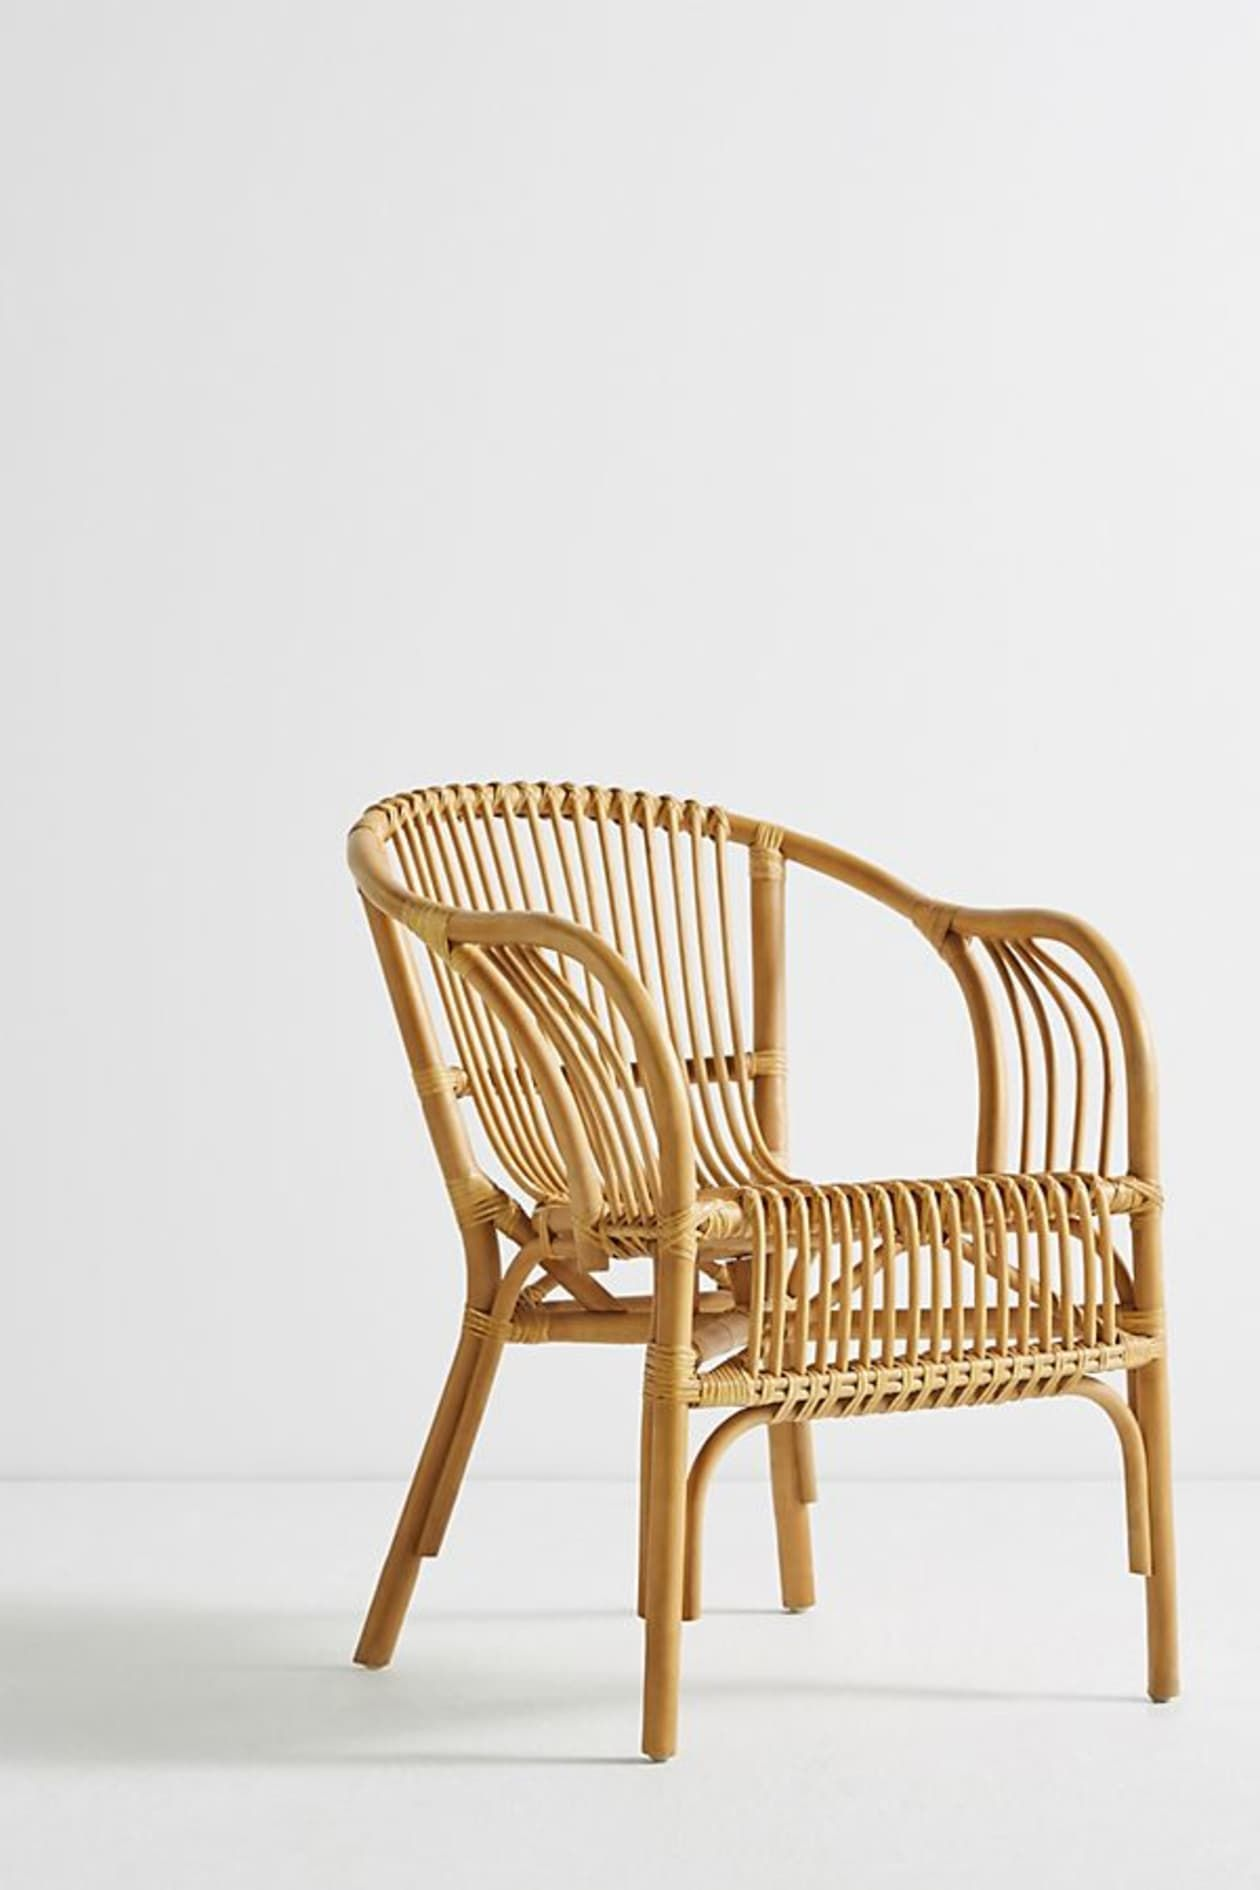 5 anthropologie living room furniture items under 100